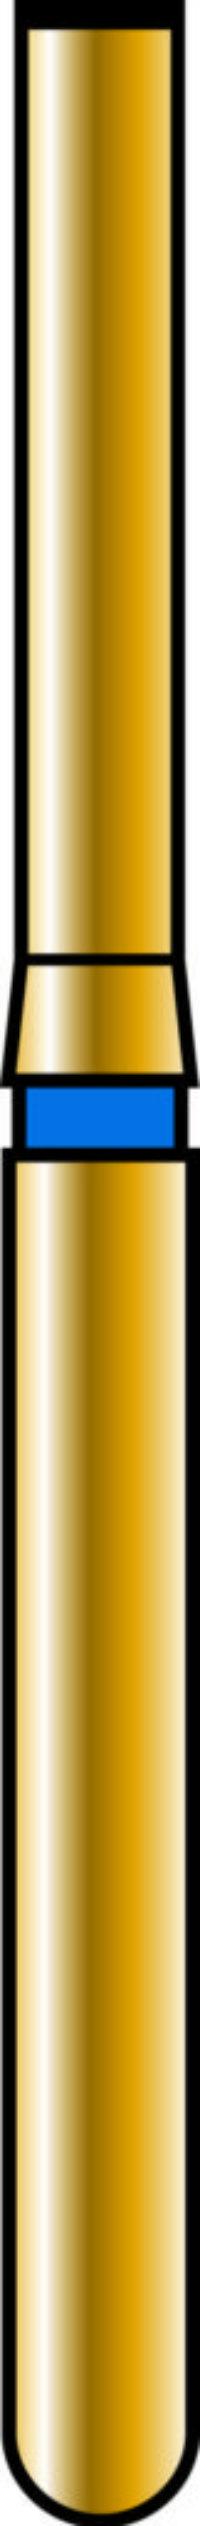 End Cutting 10mm Gold Diamond Bur